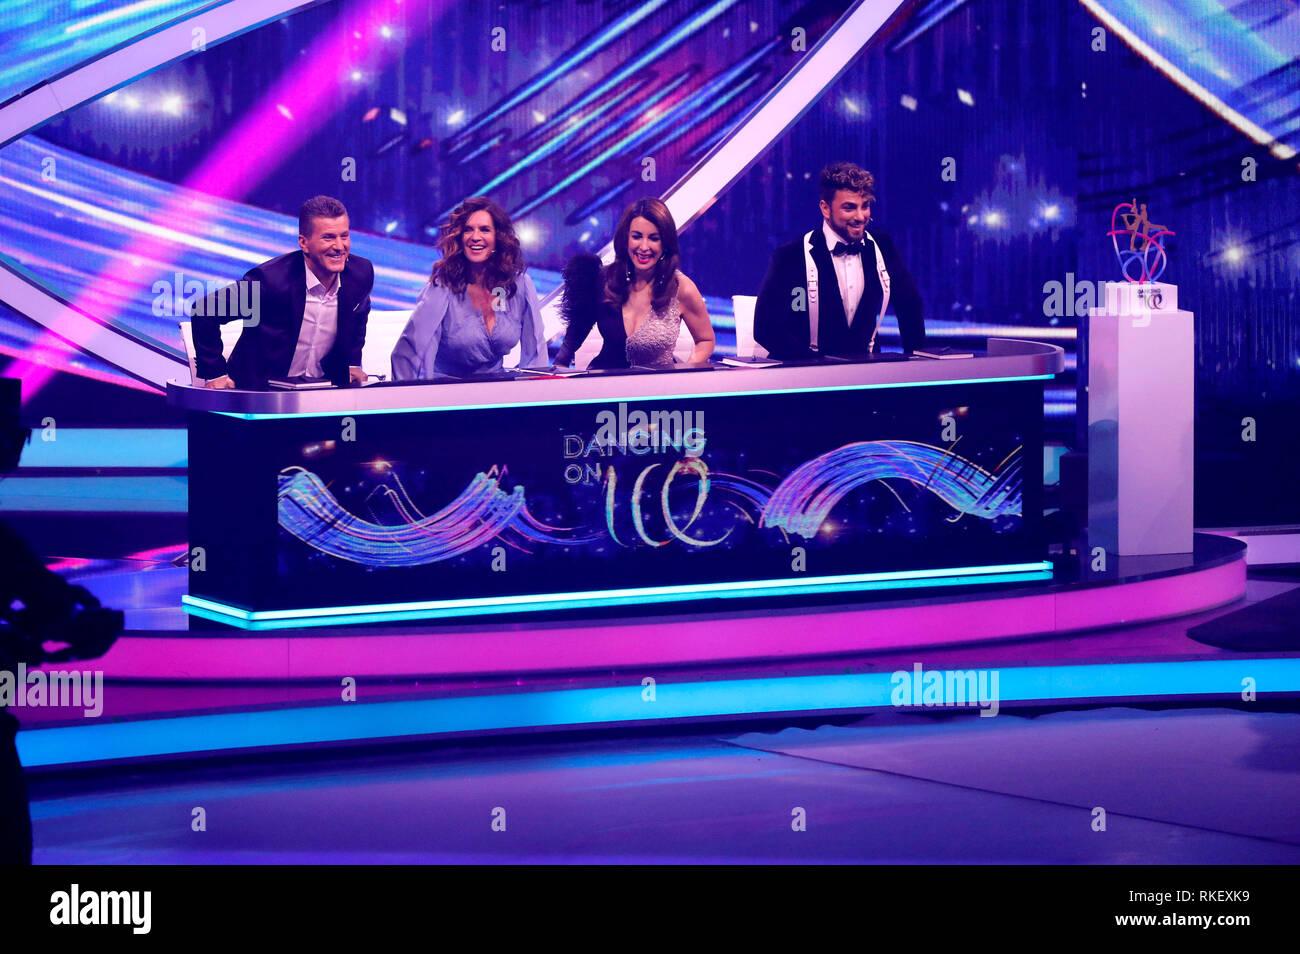 "Daniel Weiss, Katarina Witt, Judith Williams und Cale Kalay im Finale der Sat.1-Show ""dancing on Ice"" in den MMC-Studios. Köln, 10.02.2019 Stockbild"